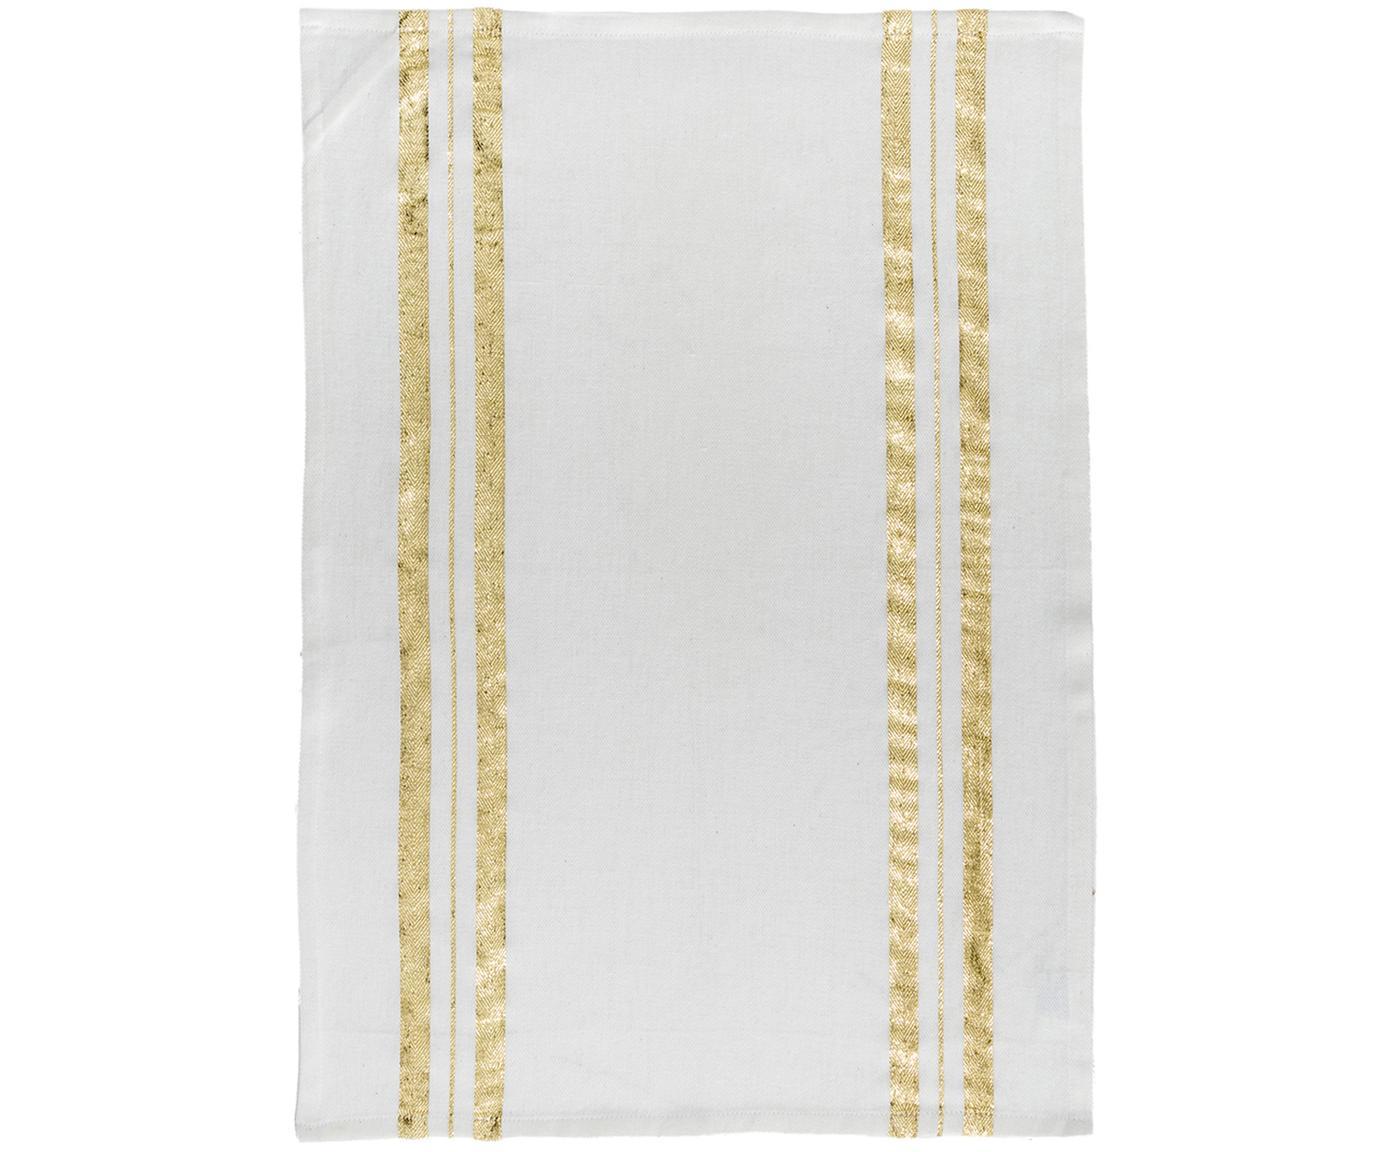 Theedoek Corinne met goudkleurige details, Katoen, Wit, goudkleurig, 50 x 70 cm